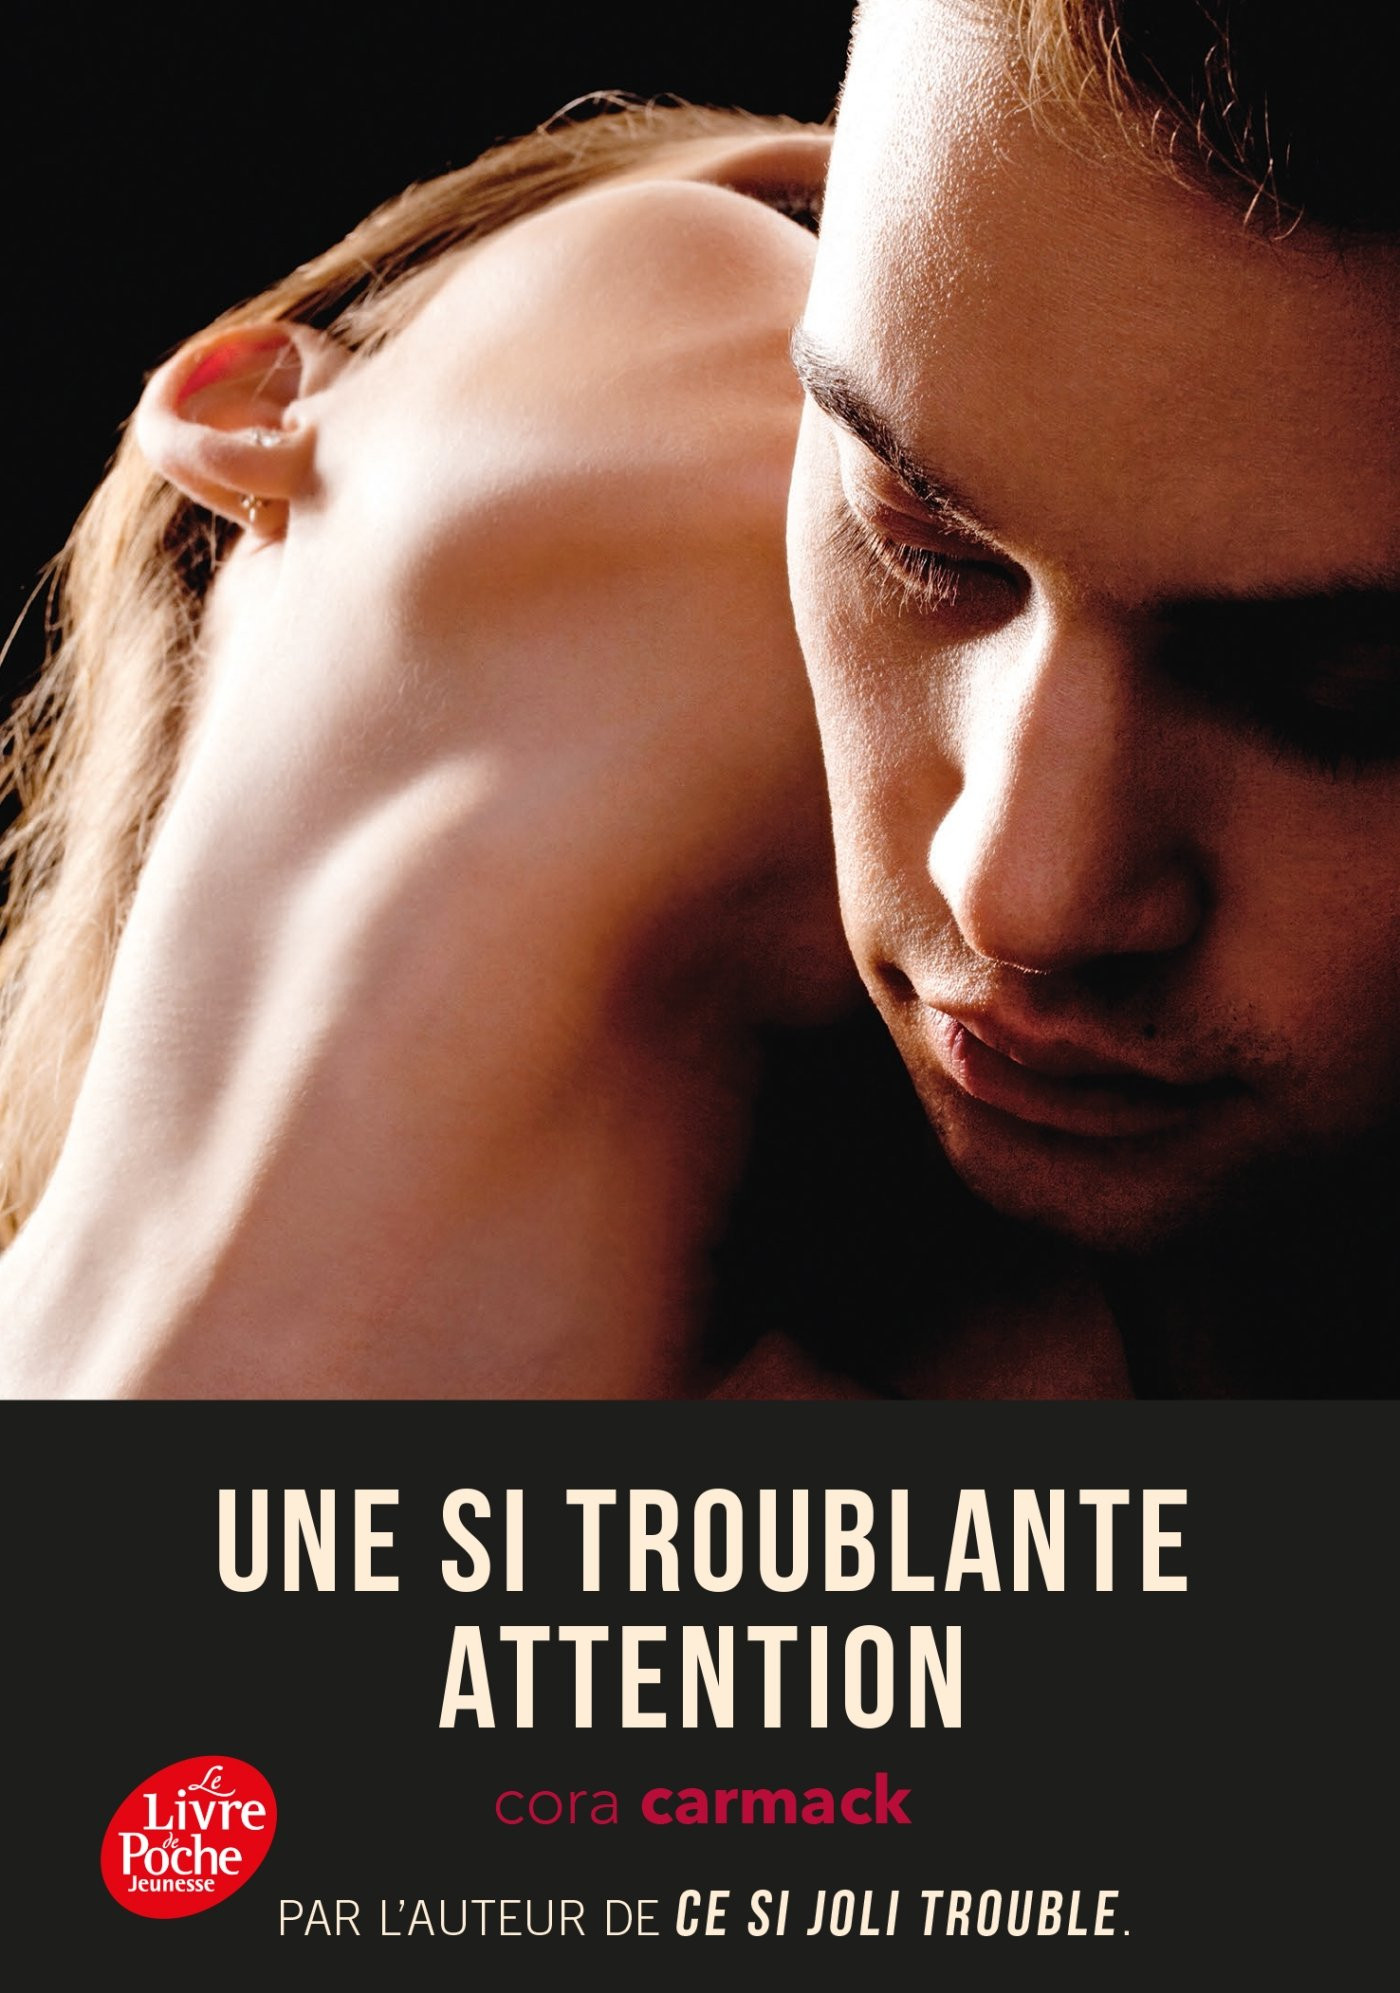 Une si troublante attention - Tome 3: Ce si joli trouble: Amazon.fr: Cora  Carmack, Sophie Passant: Livres